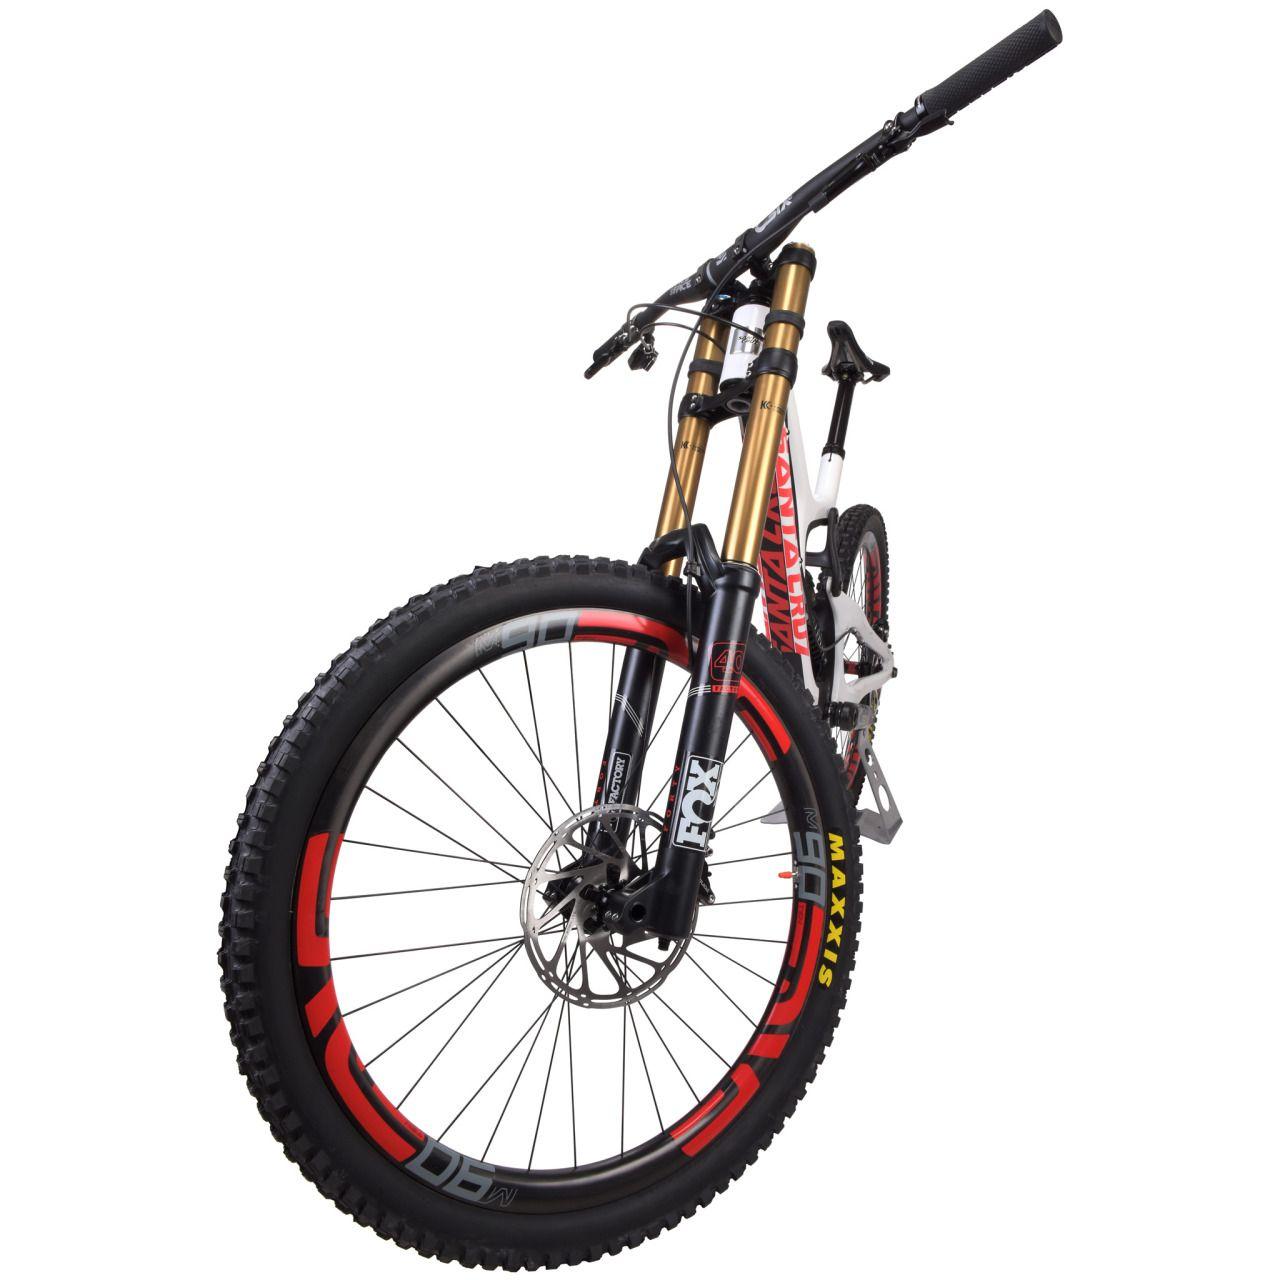 Vtt santa cruz v10 carbone cc x01 roues enve m9010 275 blanc vtt santa cruz v10 carbone cc x01 roues enve m9010 275 altavistaventures Image collections